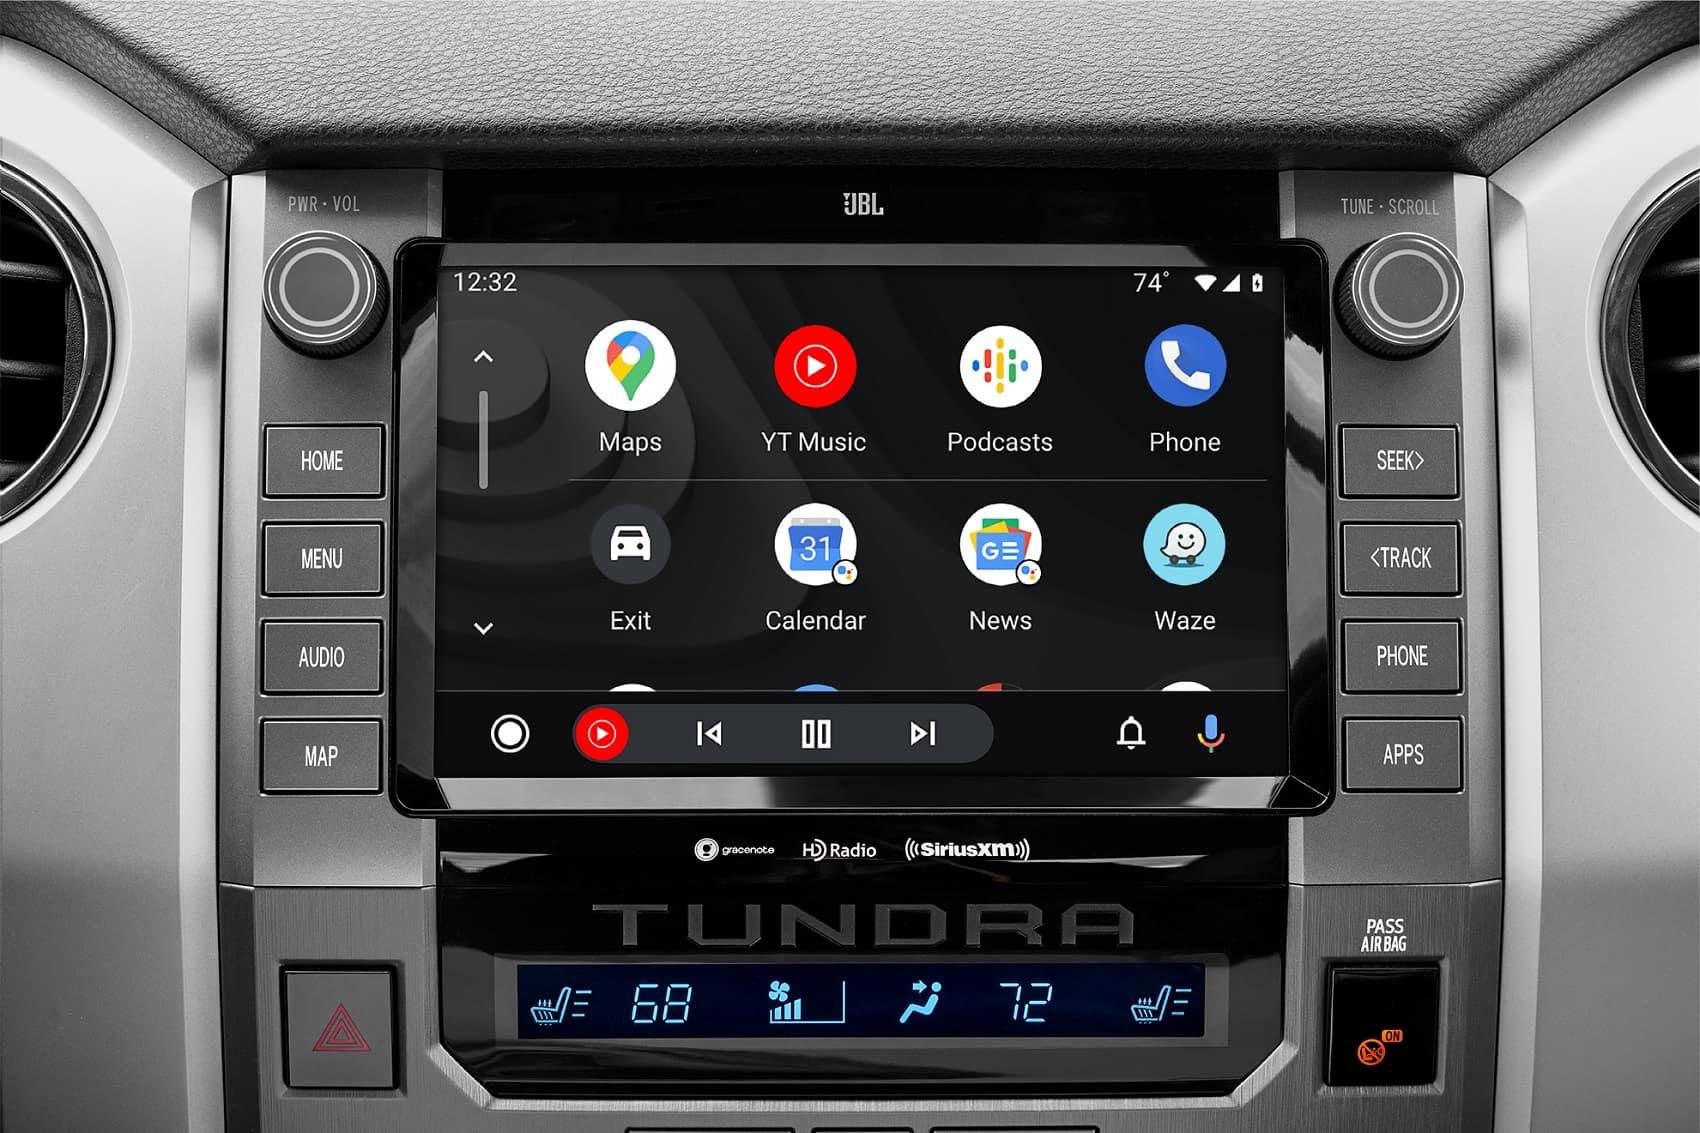 2021 Toyota Tundra Interior with Android Auto™ Integration